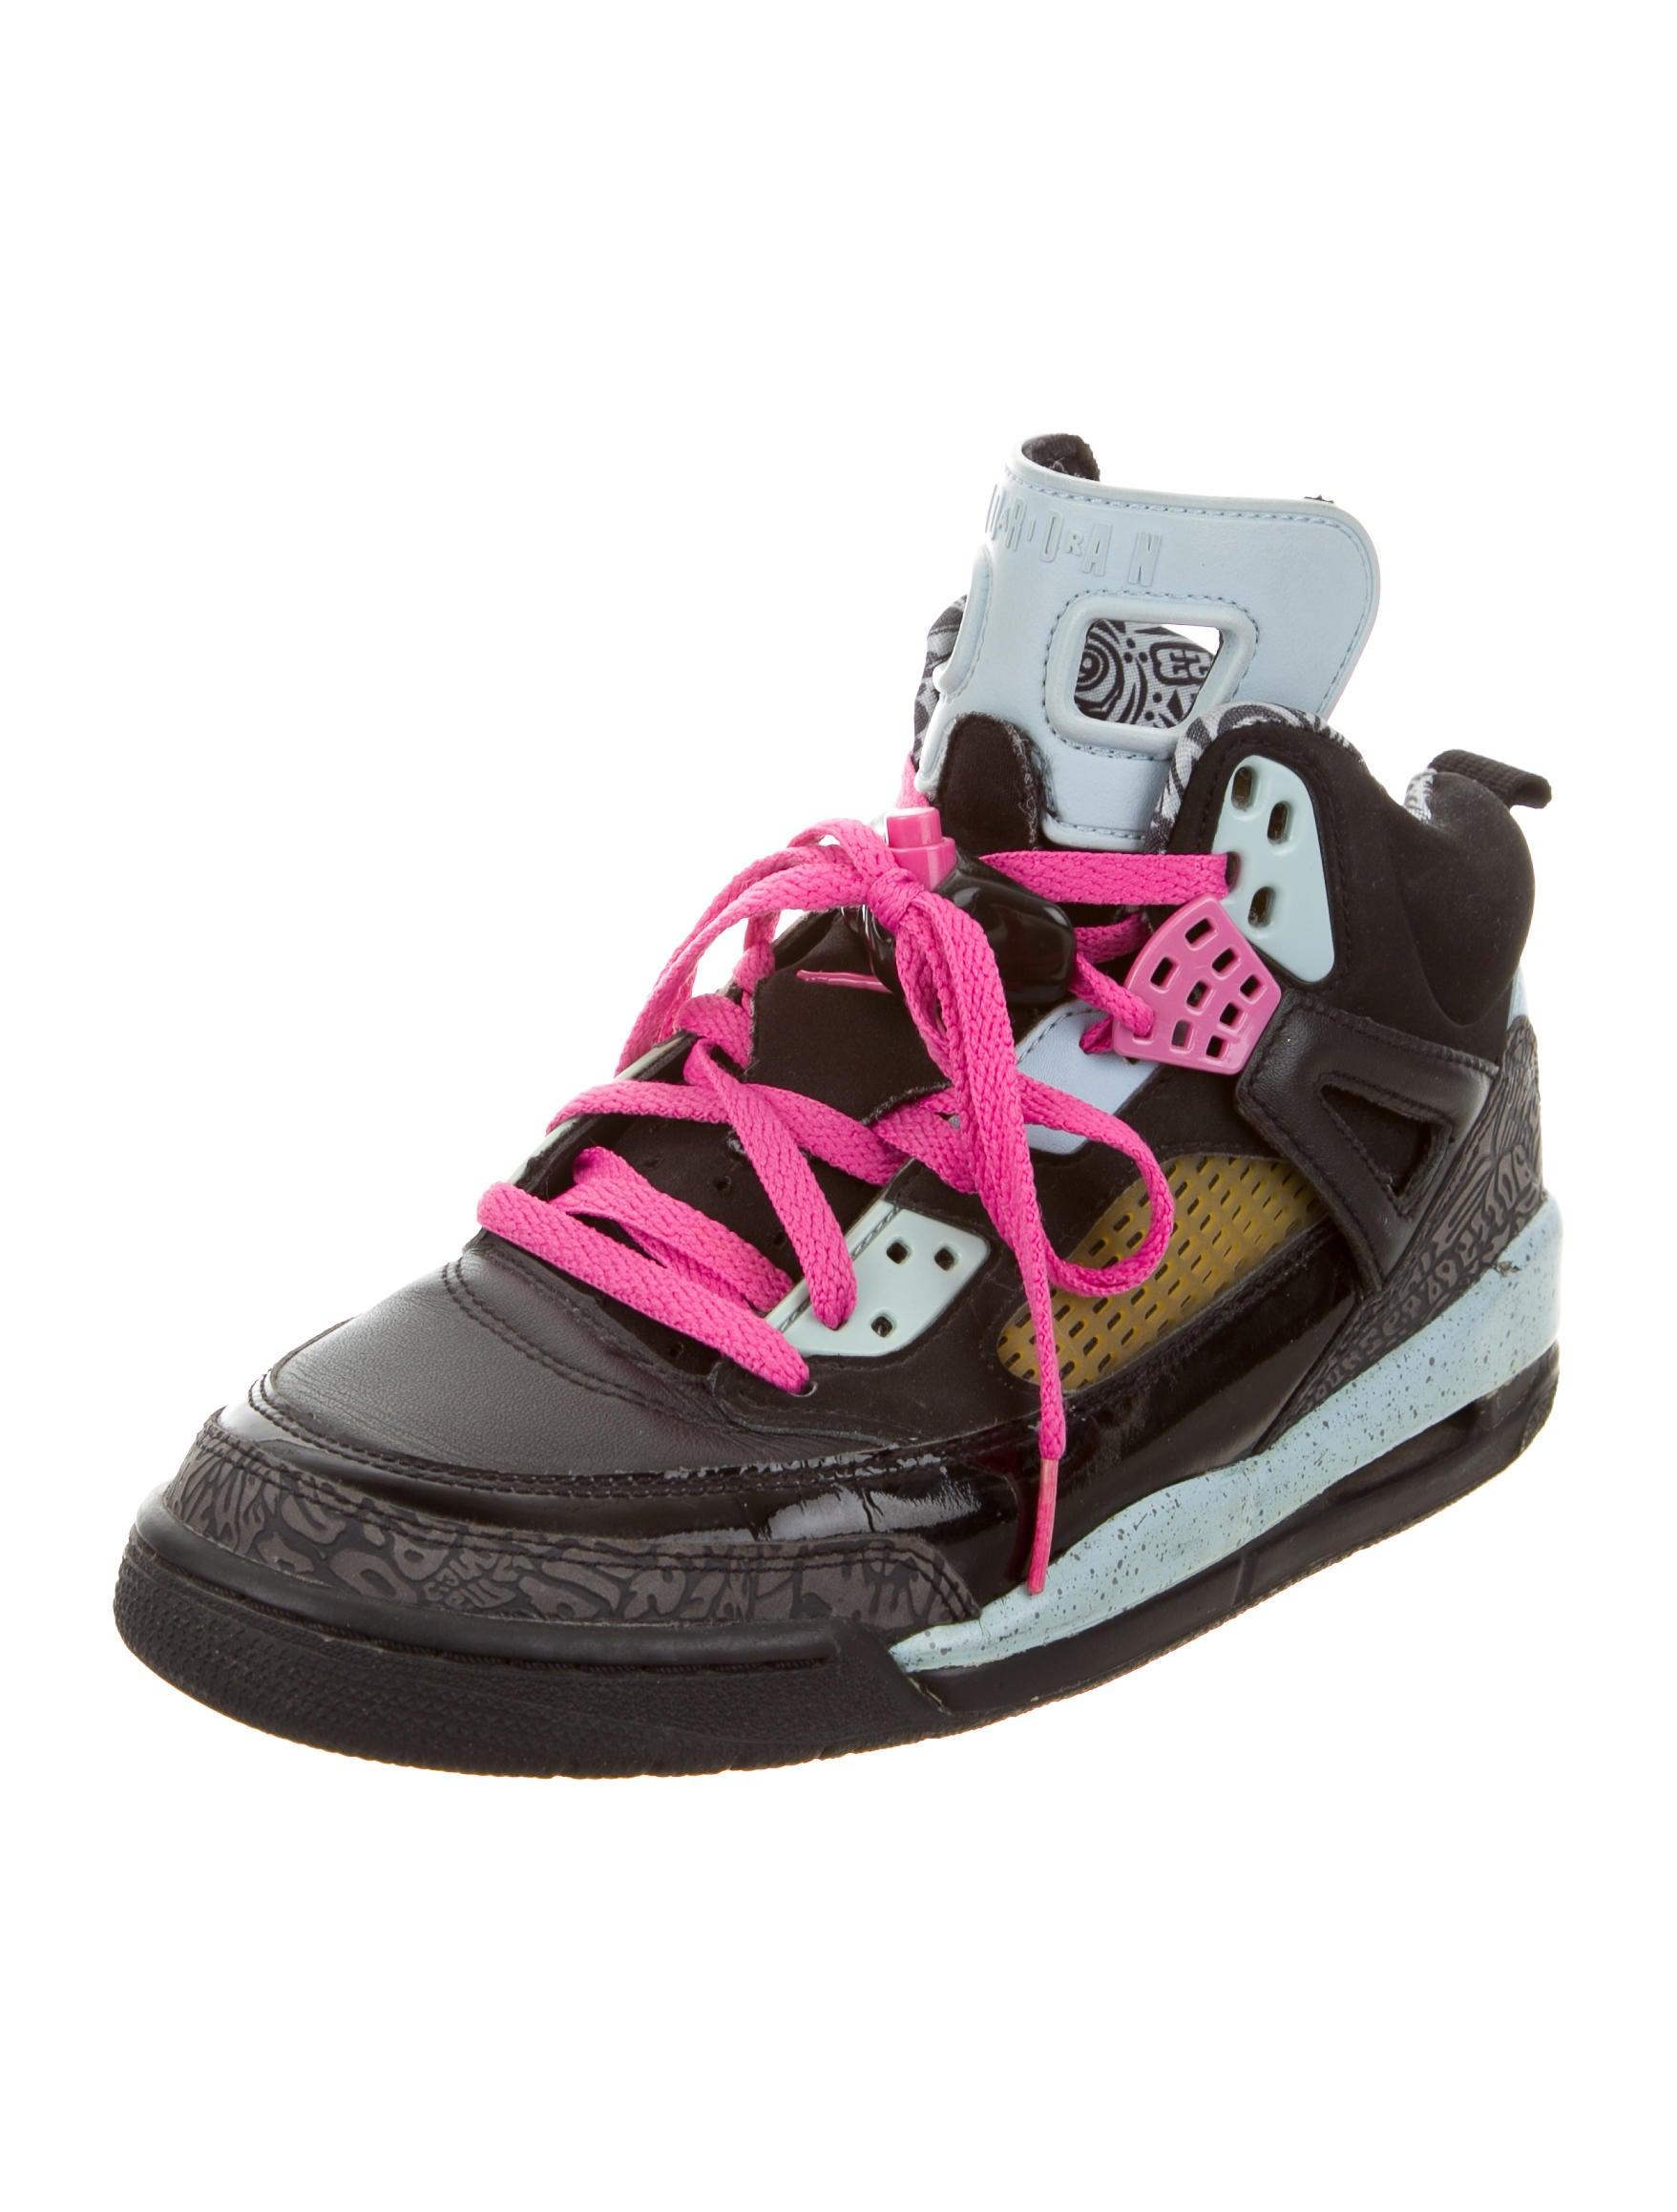 best sneakers 30b67 f2e7a nike air jordan spizike womens shoes